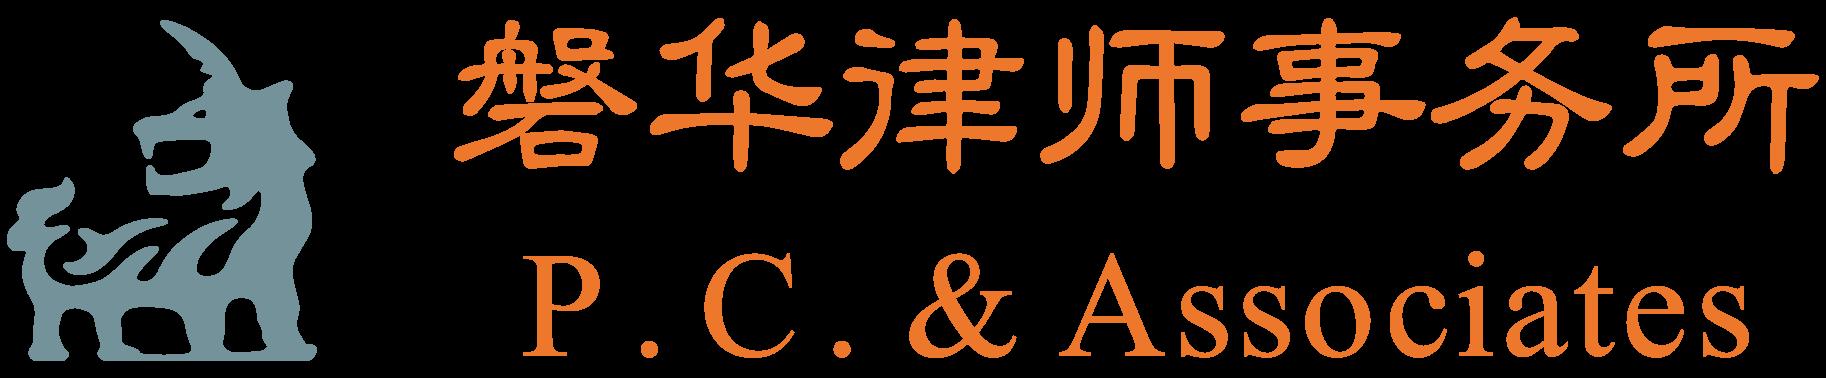 P.C.-&-Associates-NEW-LOGO